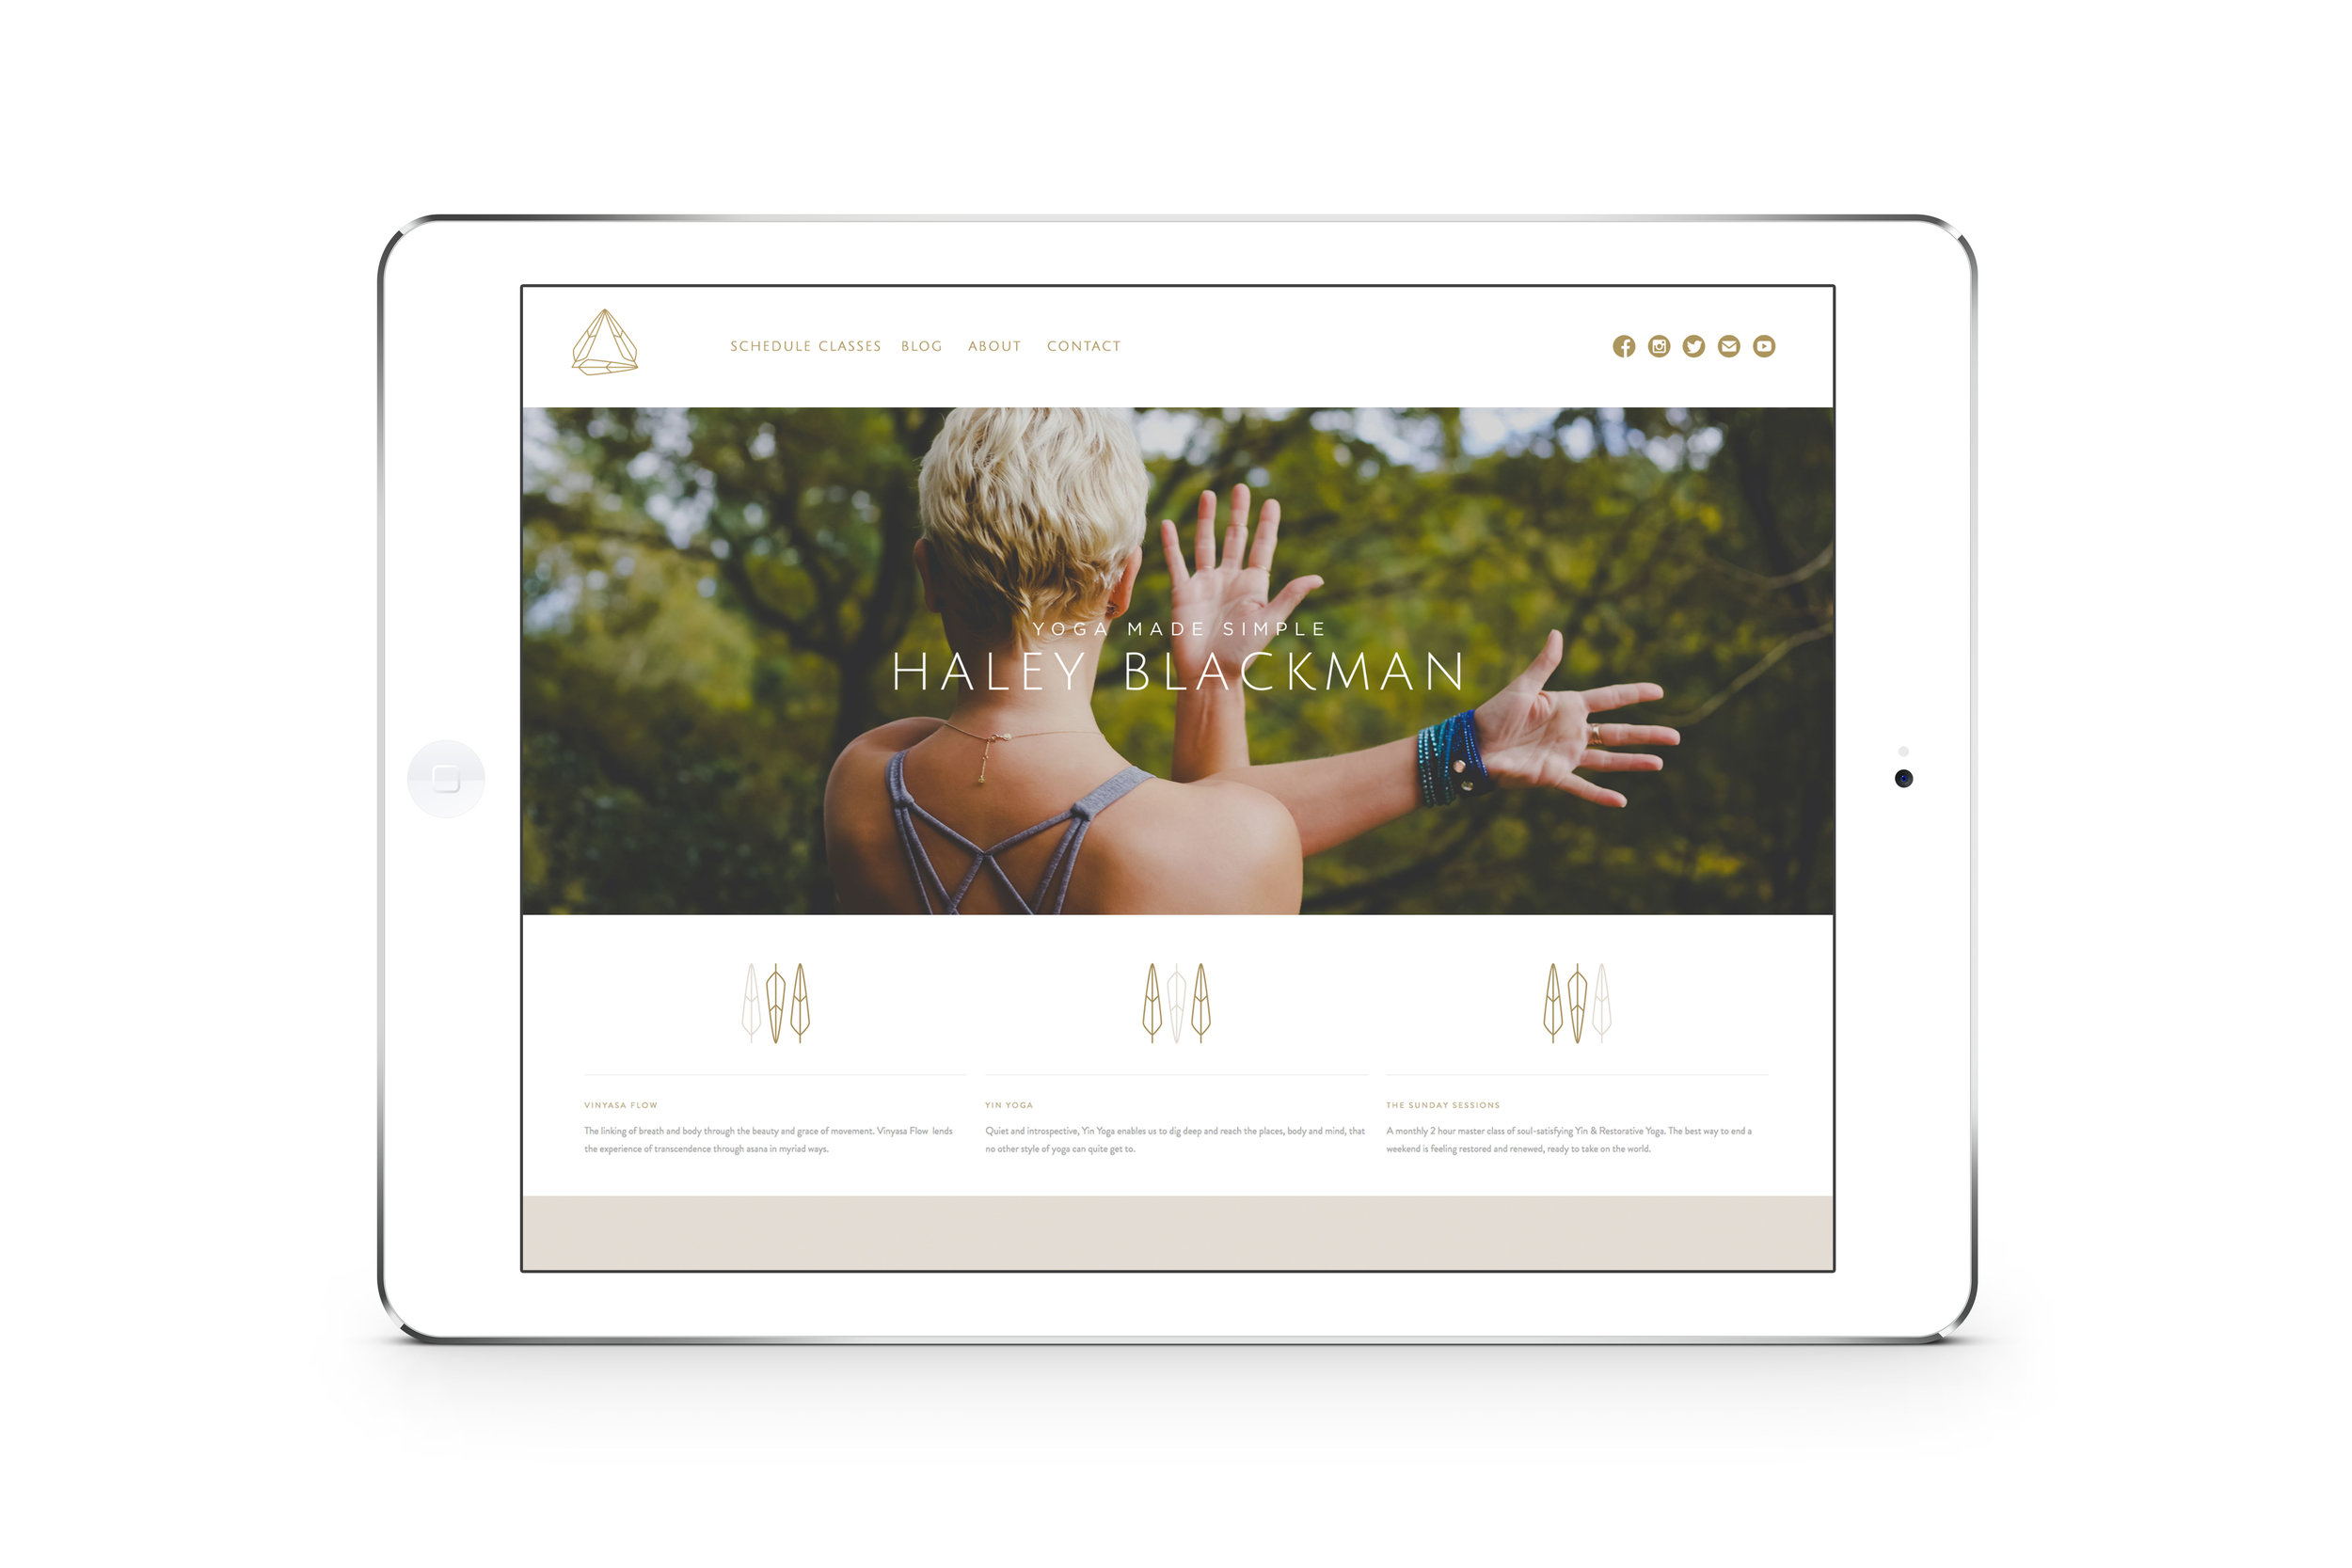 Haley Blackman Website Design